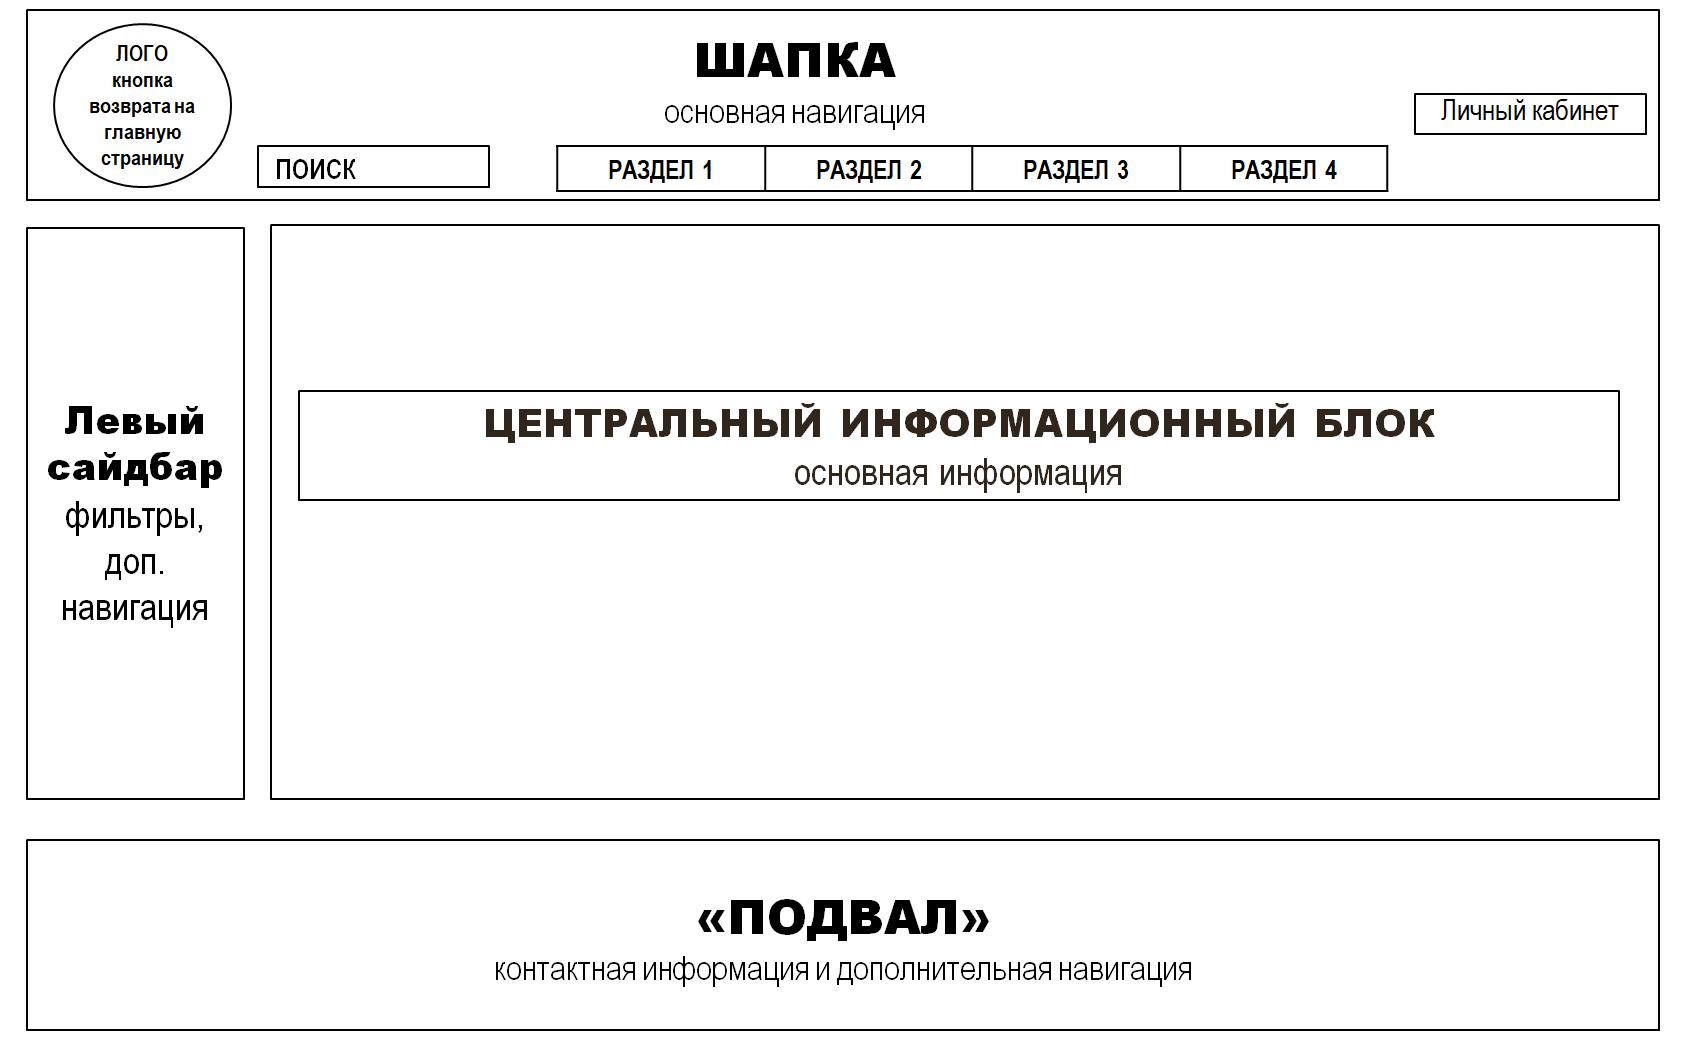 базовый шаблон-макет сайта.png